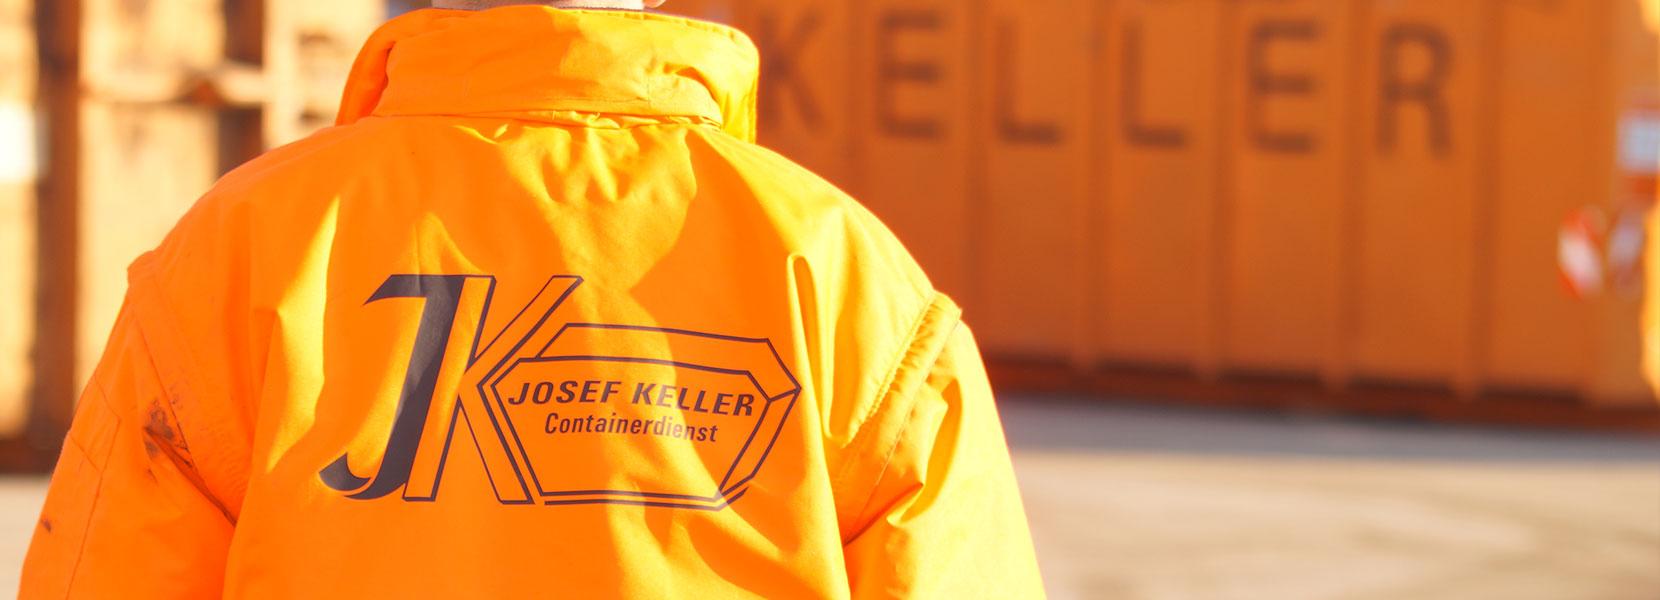 Josef Keller Containerdienst GmbH